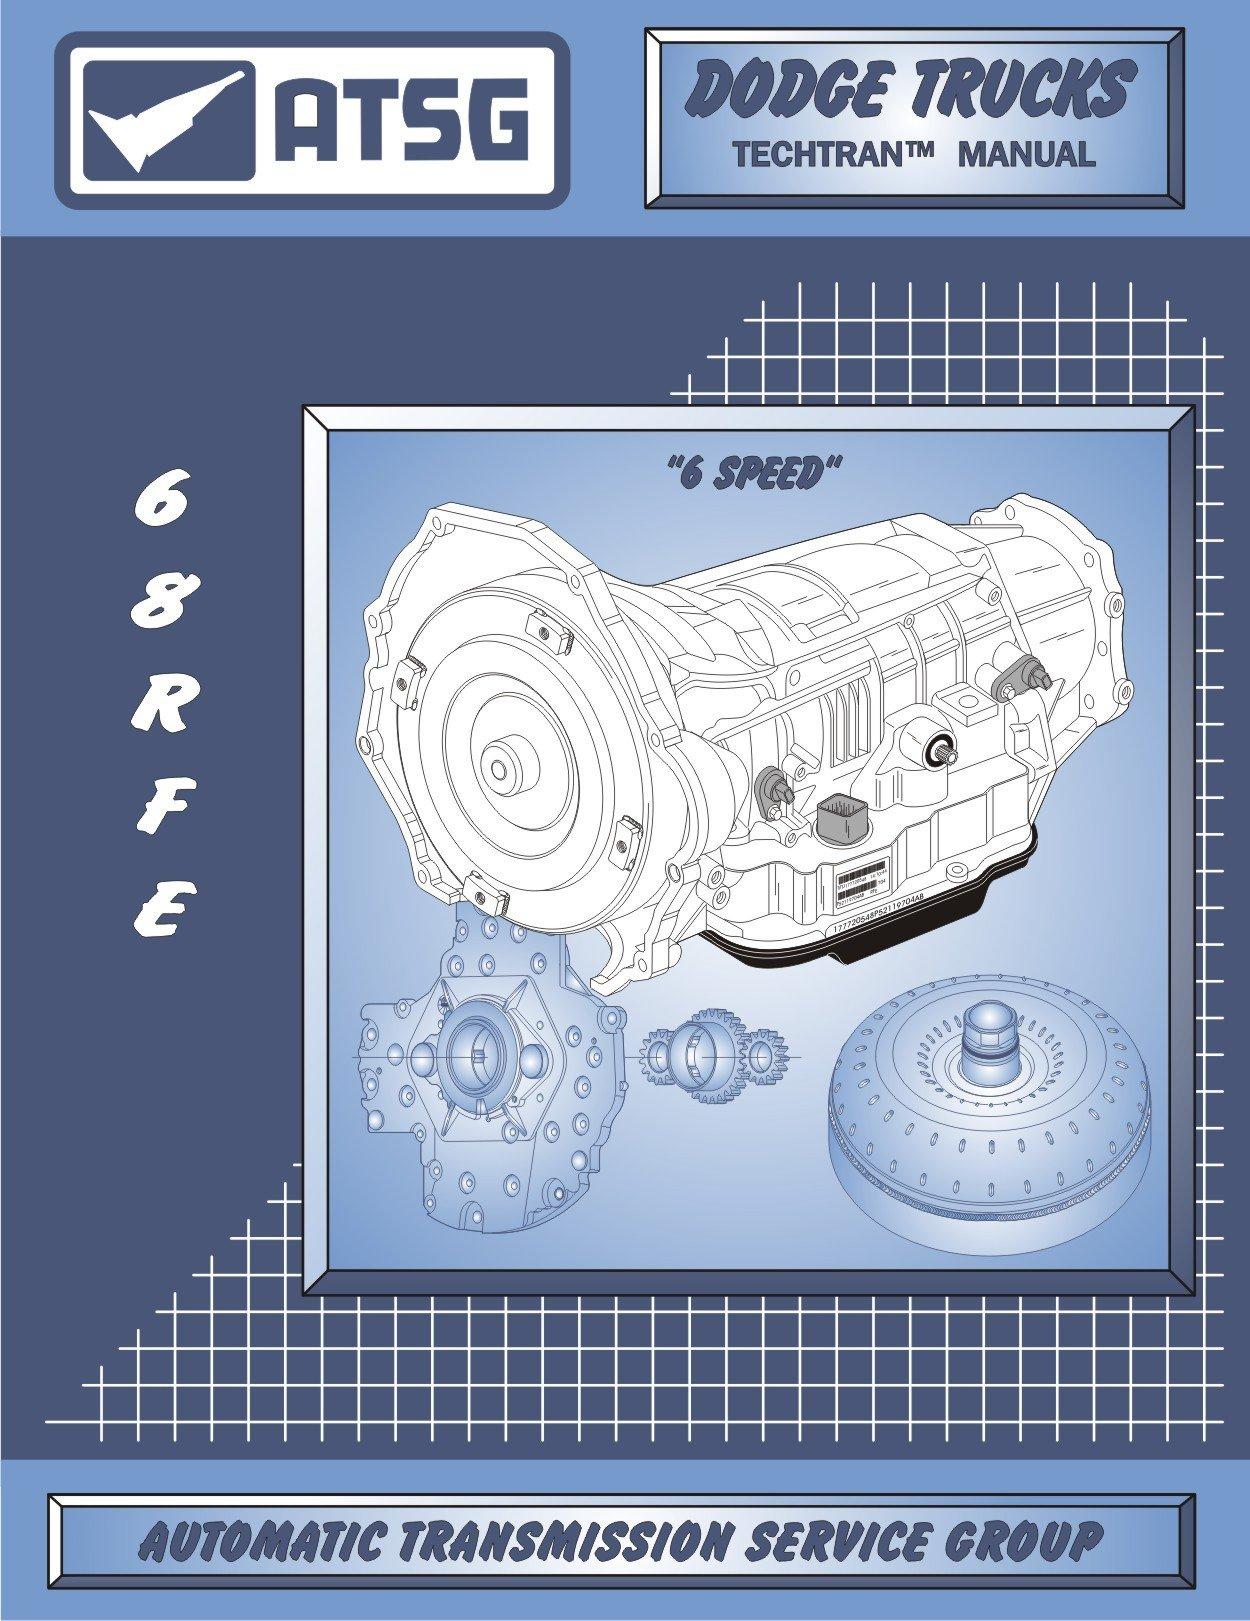 amazon com atsg 68rfe manual dodge transmission repair manual rh amazon com Dodge 6-Speed Manual Transmission Dodge Manual Transmission Diagram